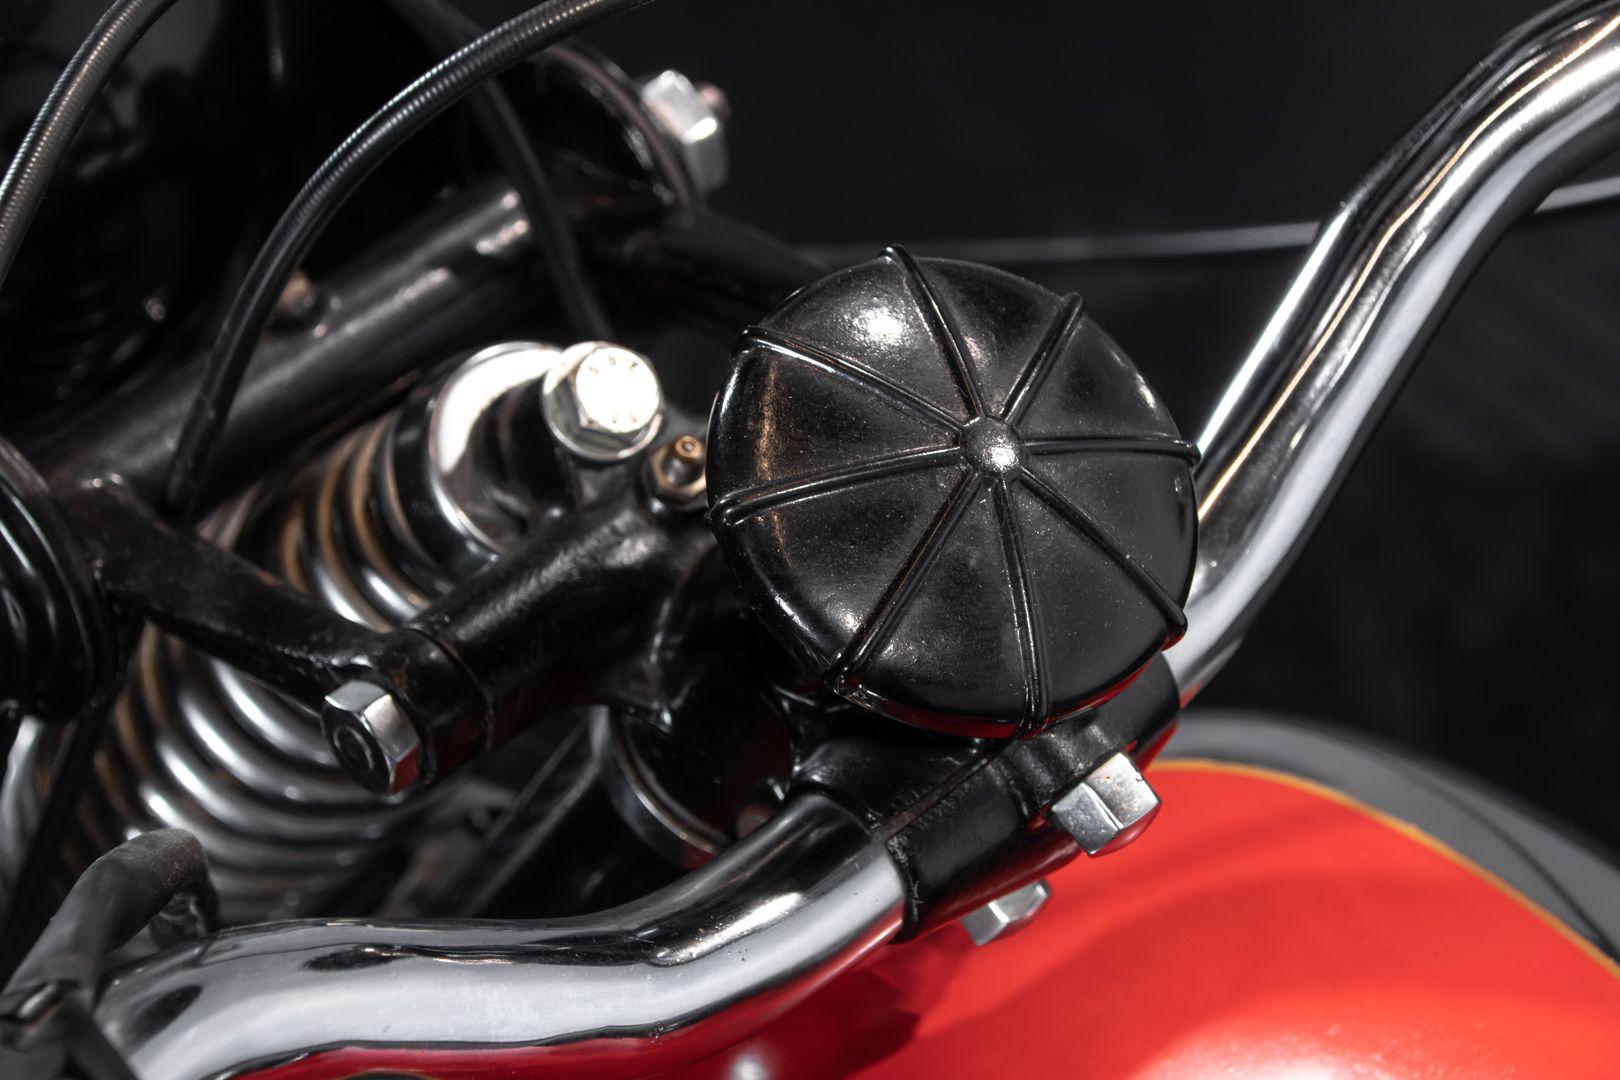 1952 Moto Morini Motore Lungo 2T 125 78777